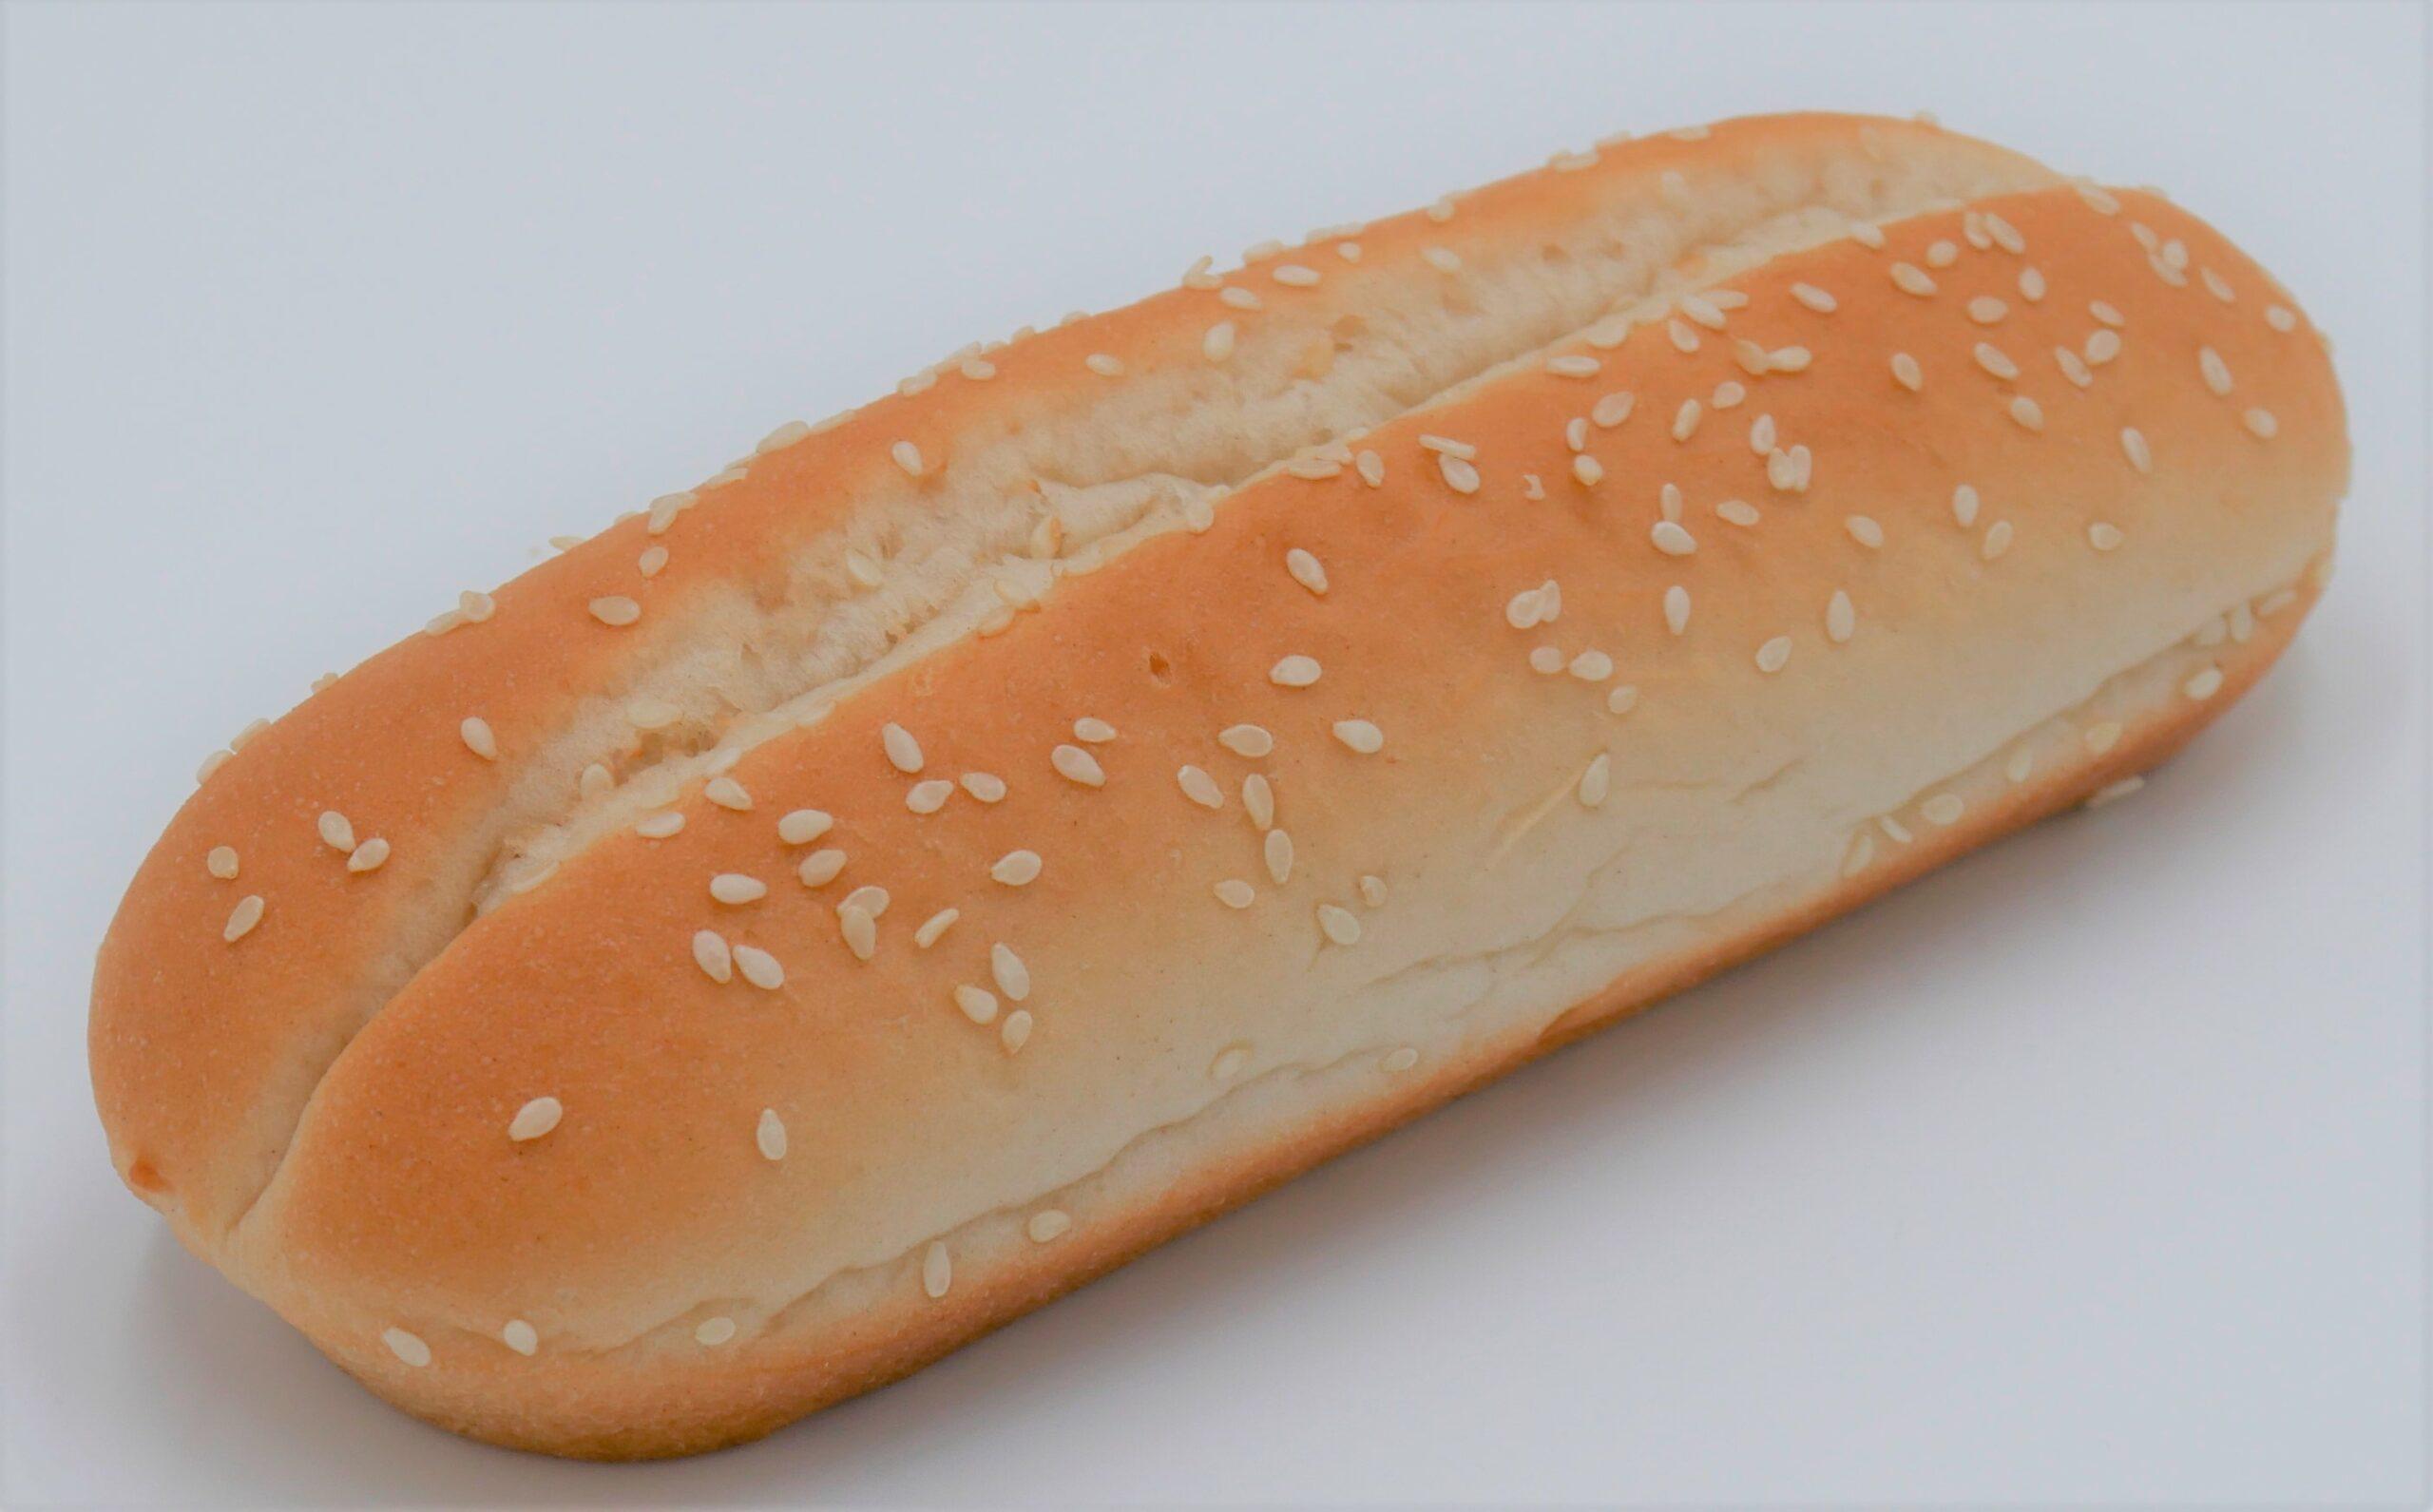 Hot Dog mit Sesam 80g Image